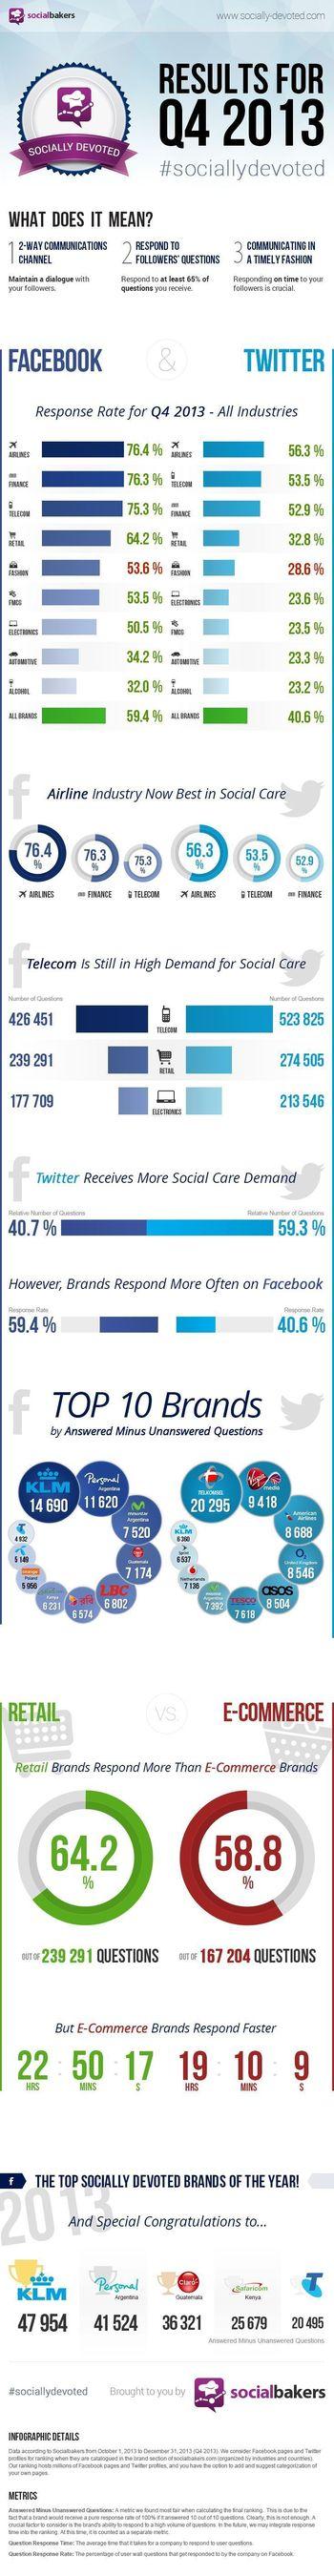 Socially Devoted Brands, Q4 2014 (PRNewsFoto/Socialbakers)